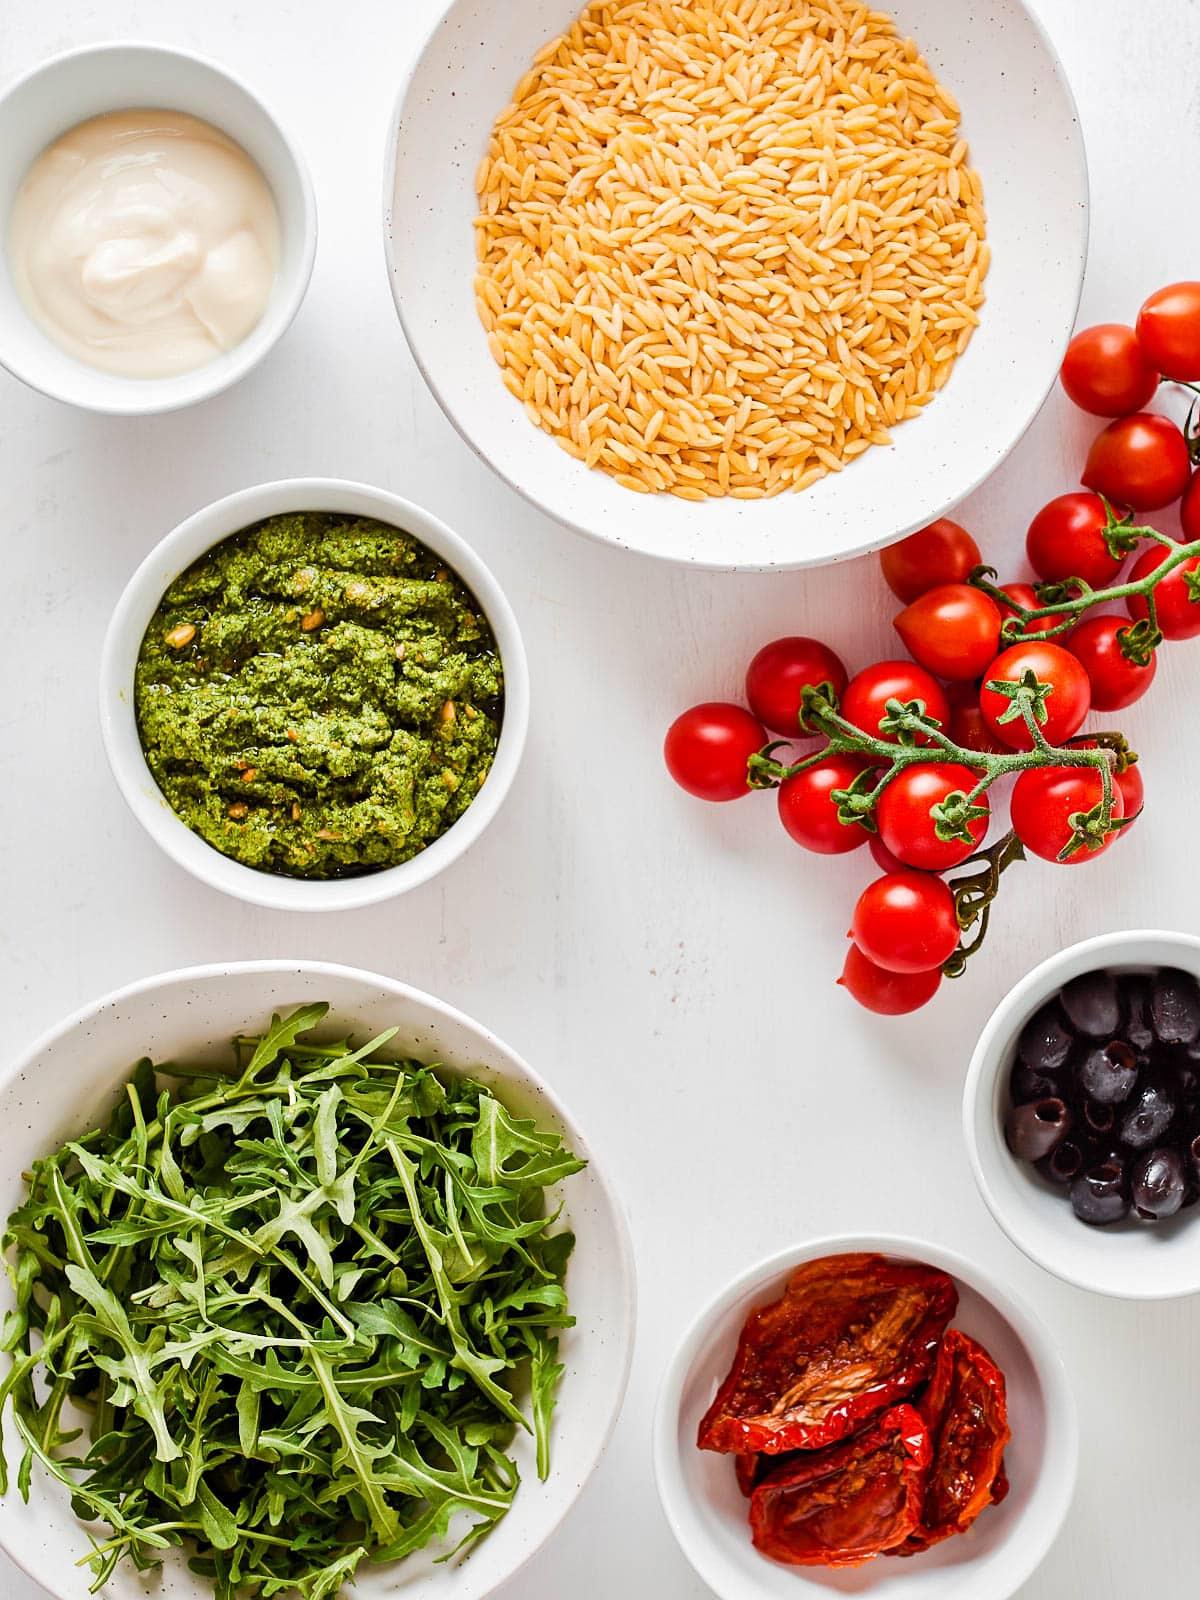 Ingredients for pesto orzo salad- orzo, tomatoes, olives, sun dried tomatoes, arugula, pesto, yoghurt